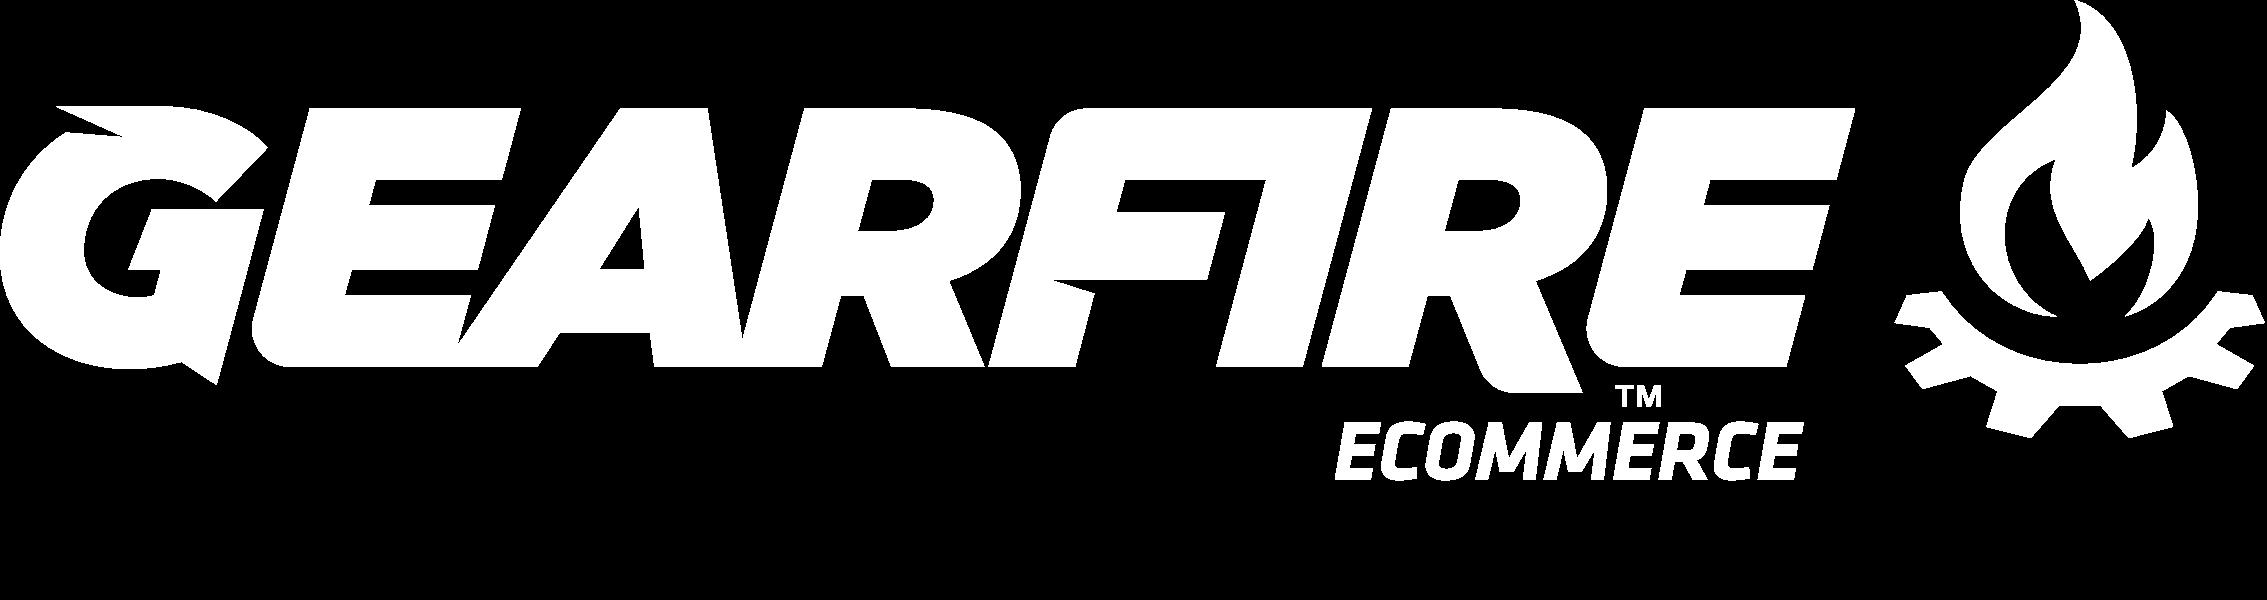 gearfire ecommerce logo